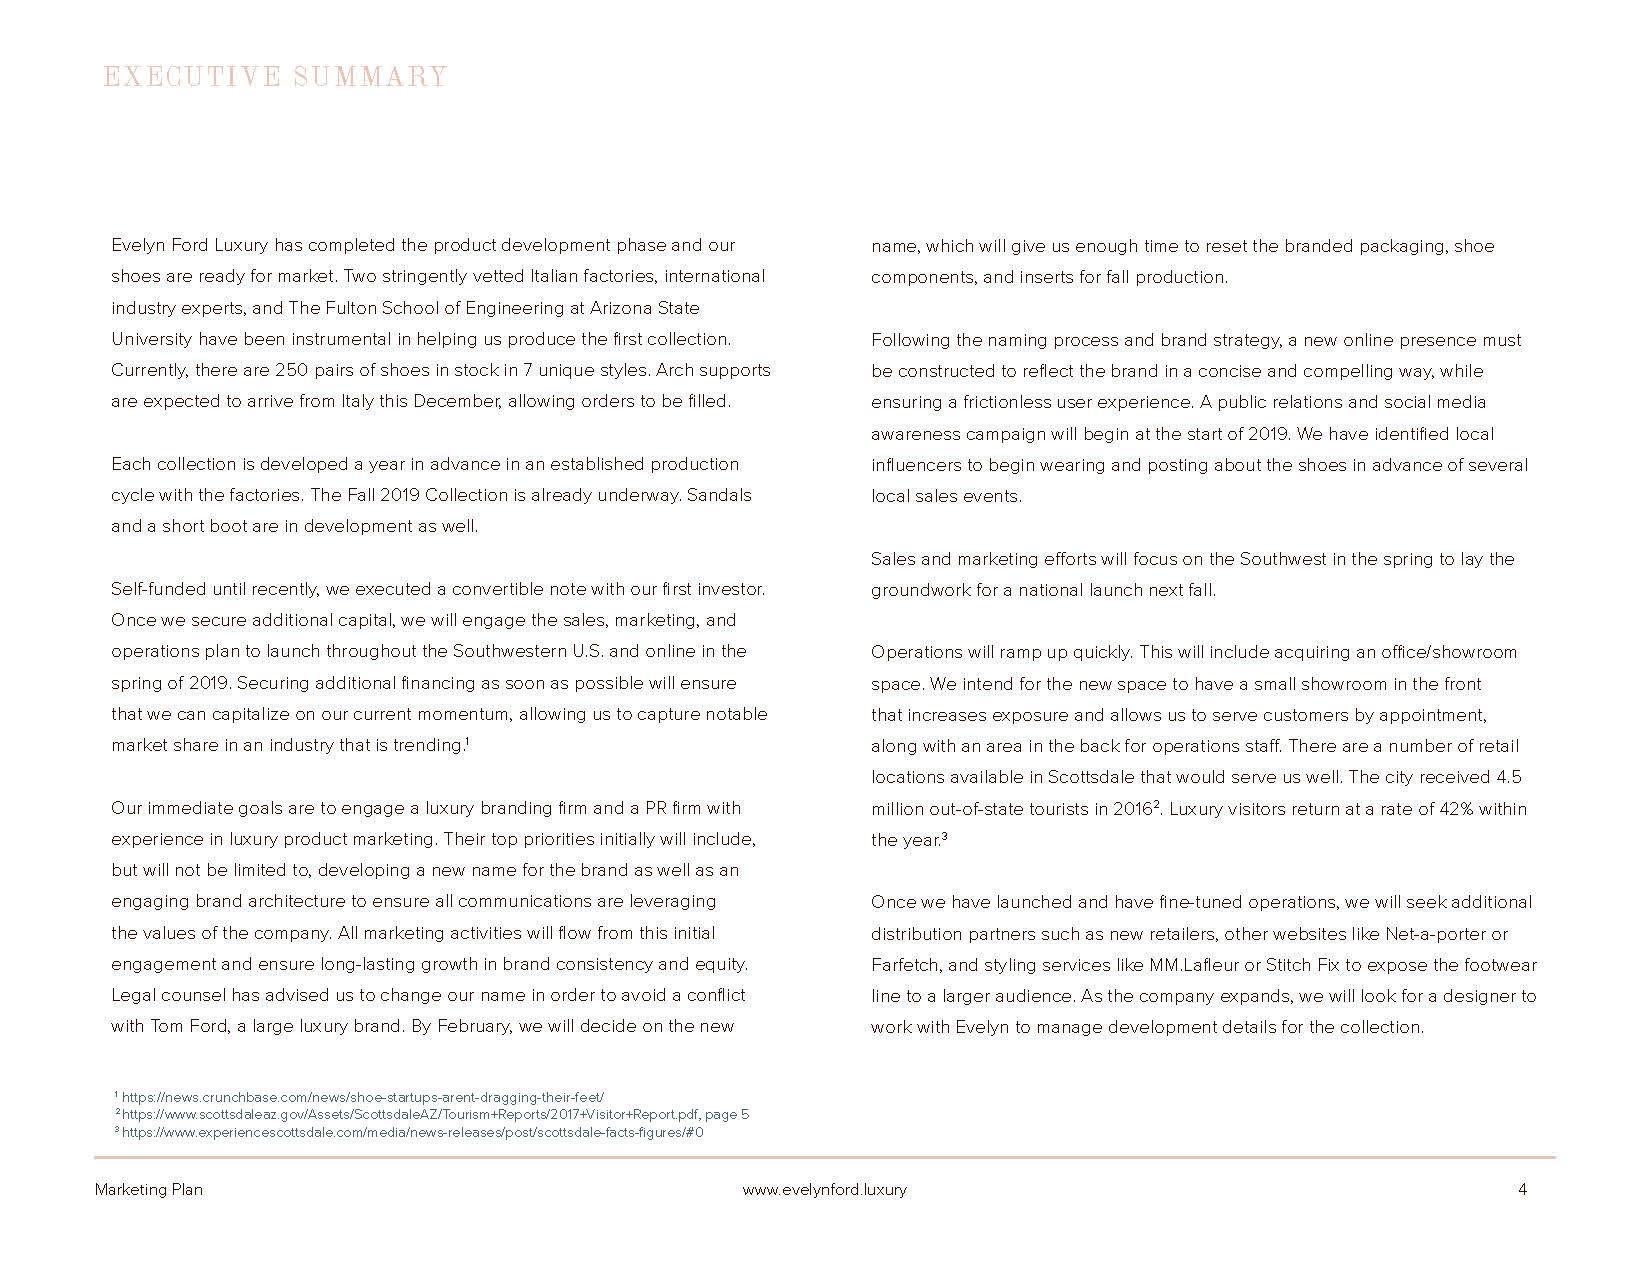 EFL_Marketing_Plan_110118_Page_04.jpg